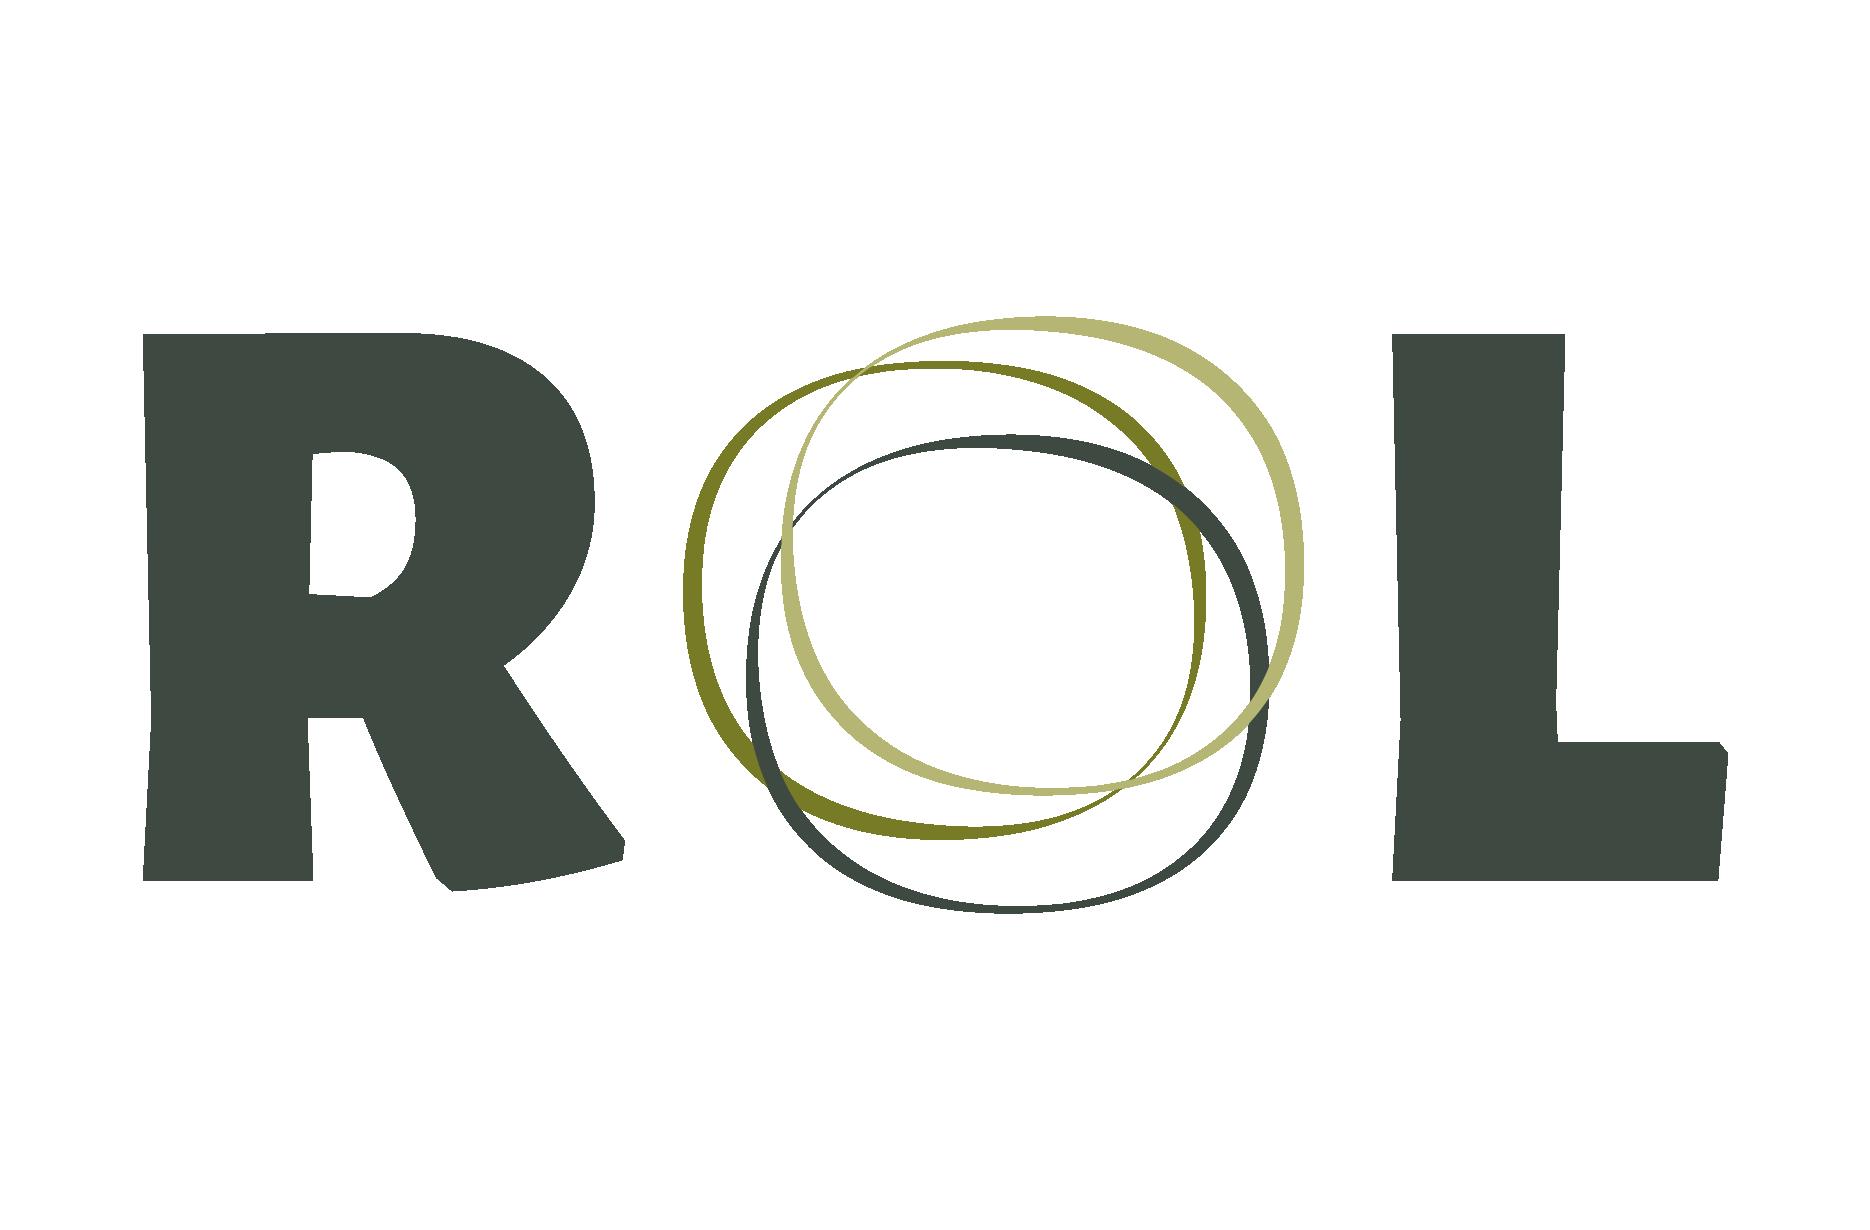 R-O-L